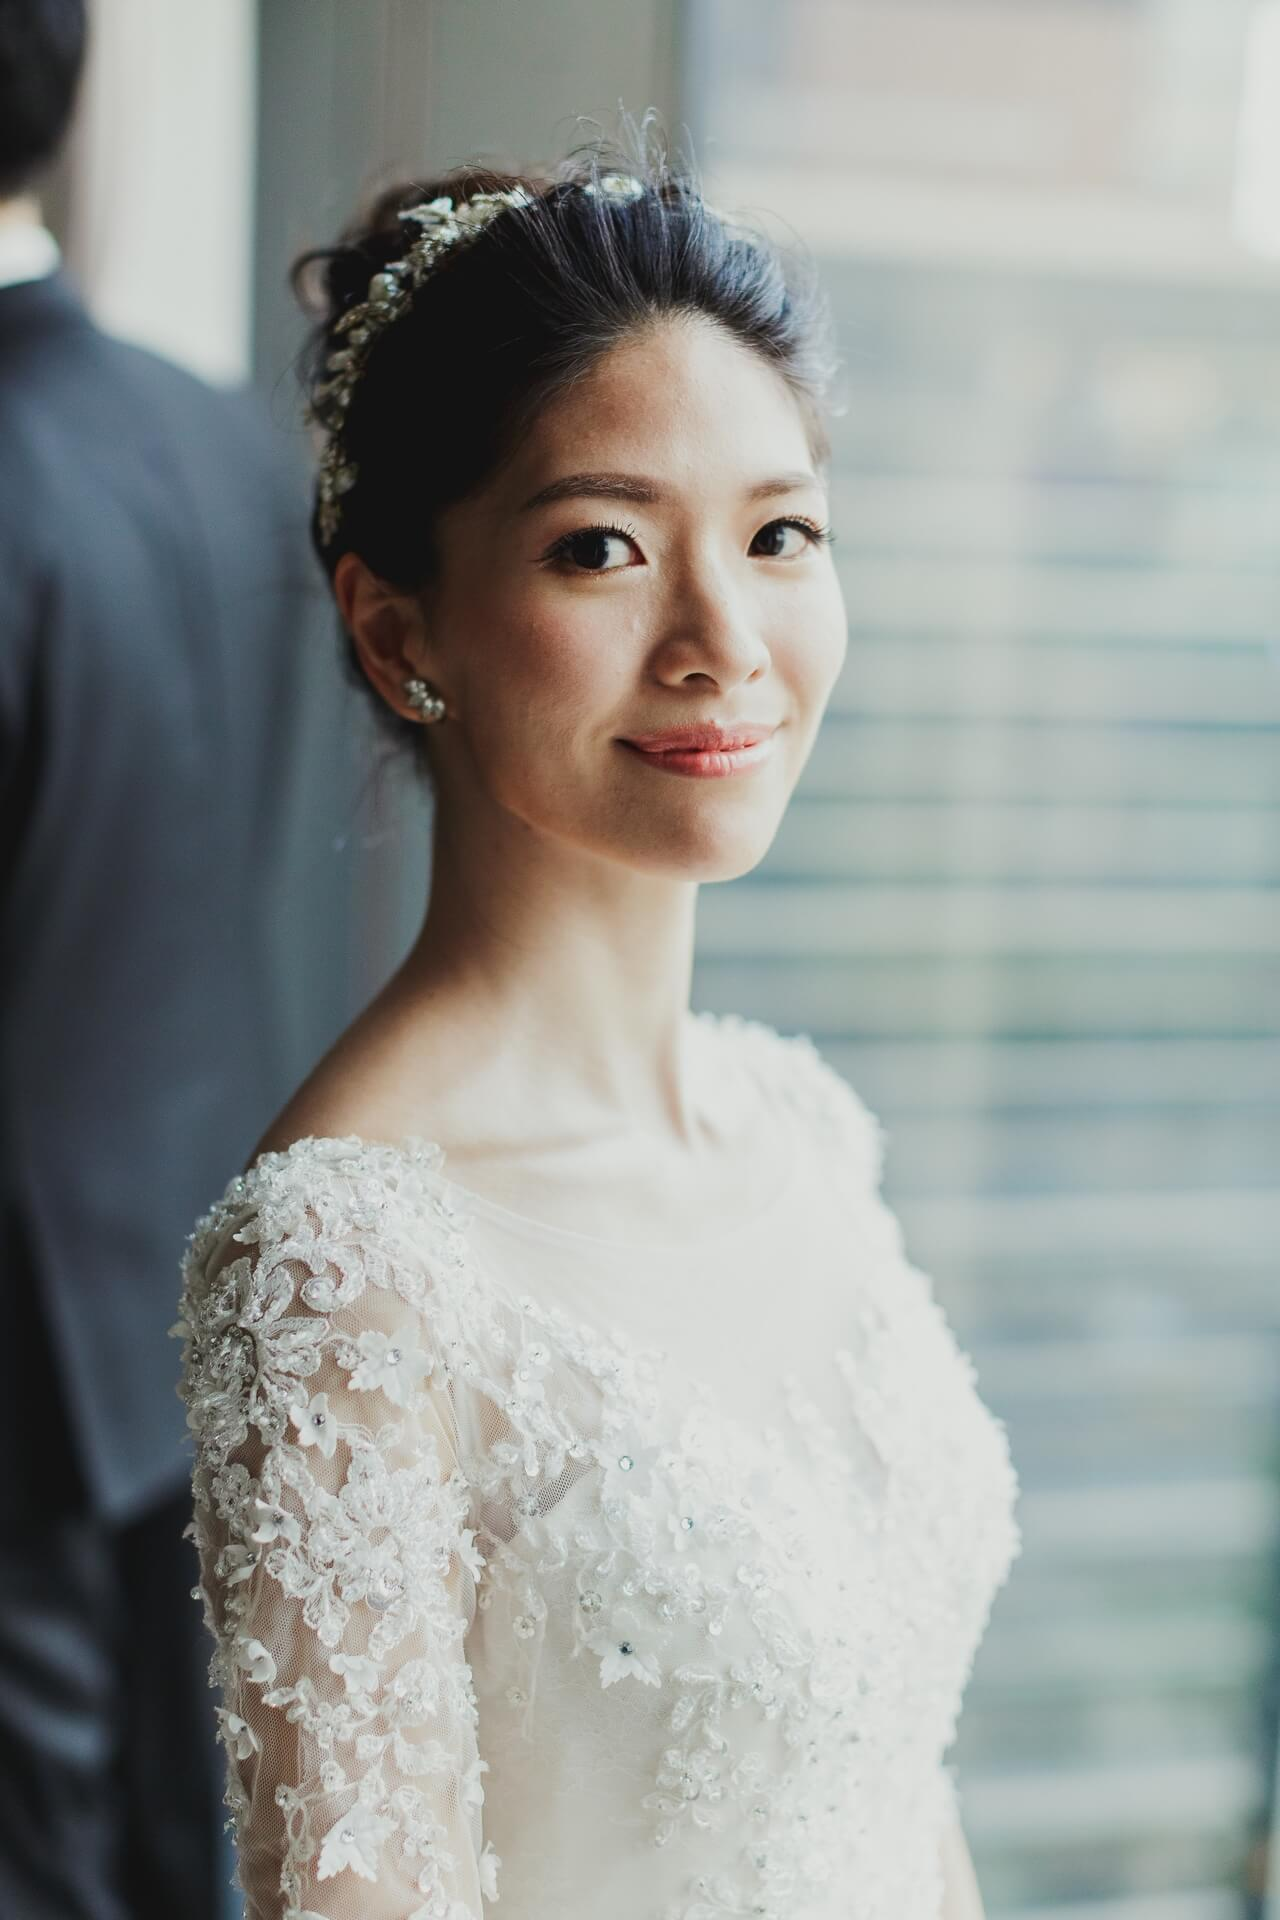 misslala 婚禮紀錄 婚禮紀實 韓國婚禮 萬豪婚禮 萬豪儀式 推薦婚攝 底片風格 電影風格 -0023.jpg